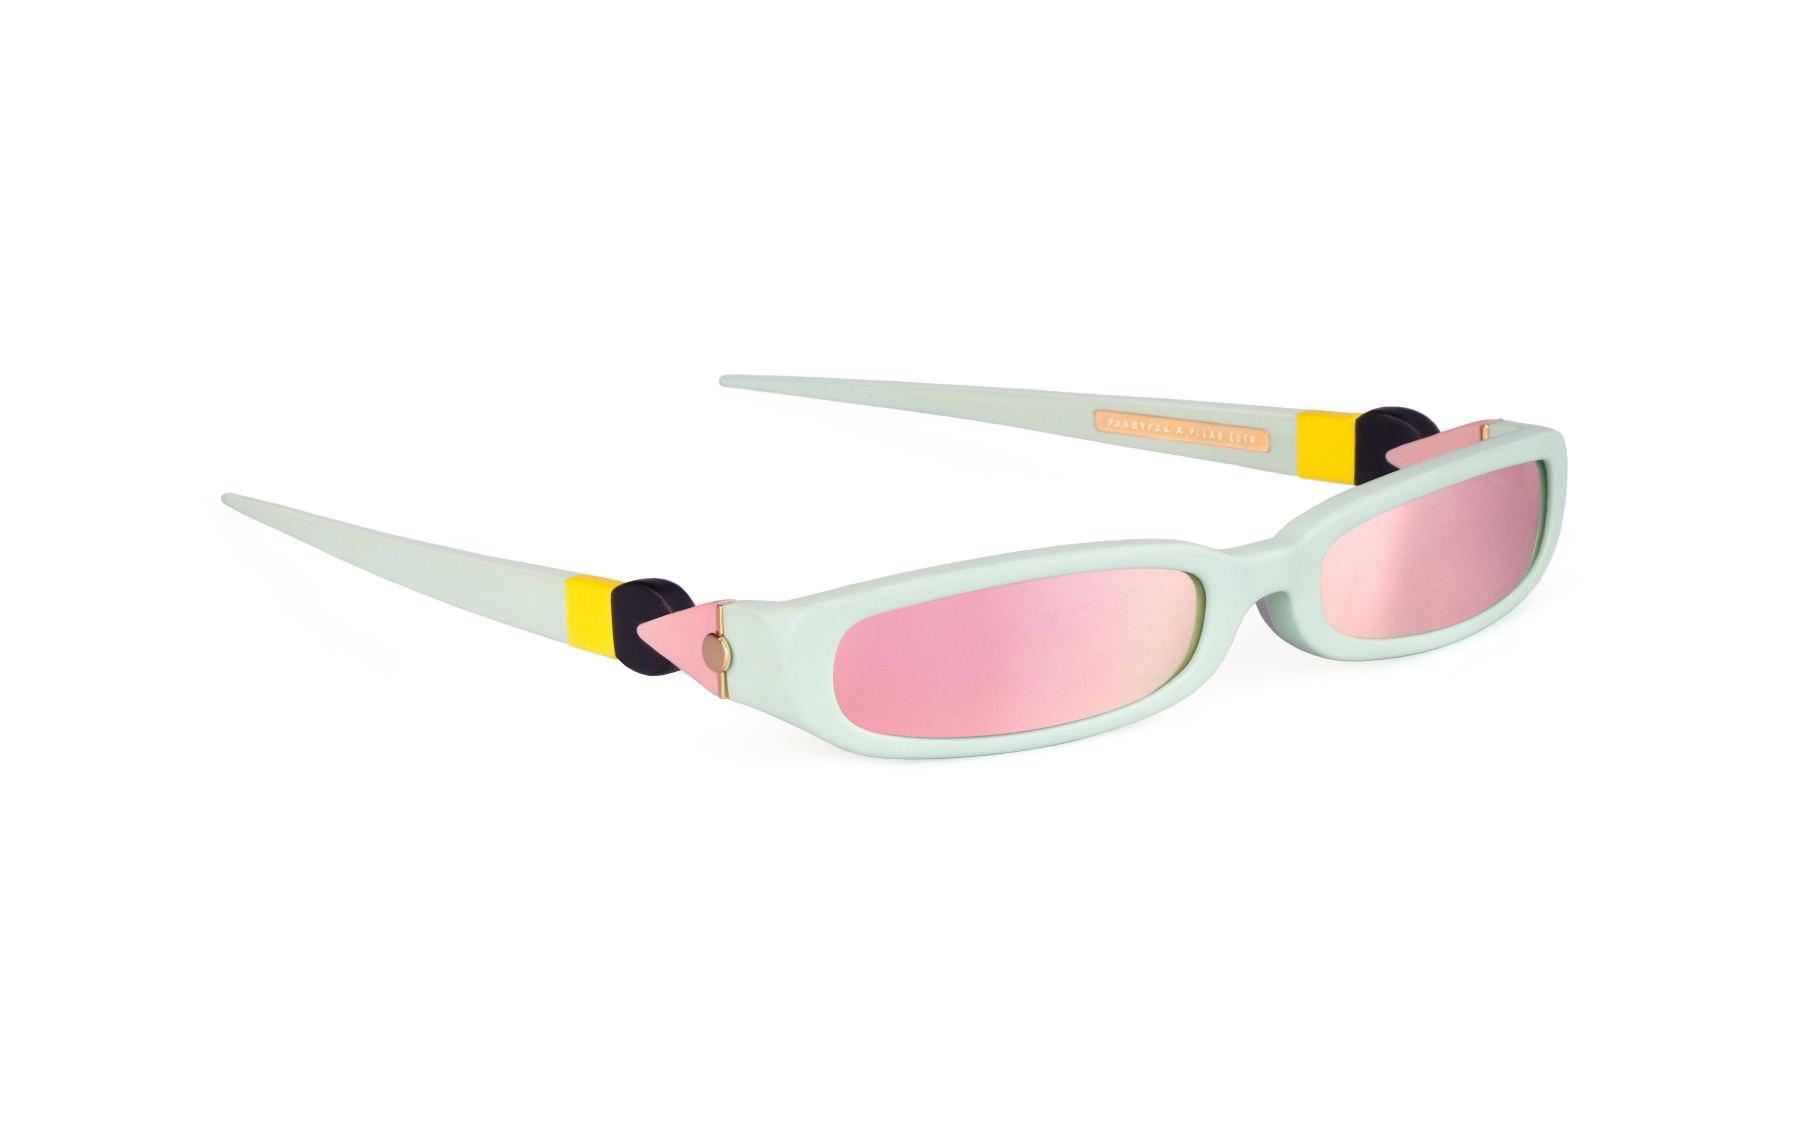 FAKBYFAK x Pilar Zeta  GRACE. Sunglasses. Matte Mint & Mirrored Pink Code: FBF-14-02-04